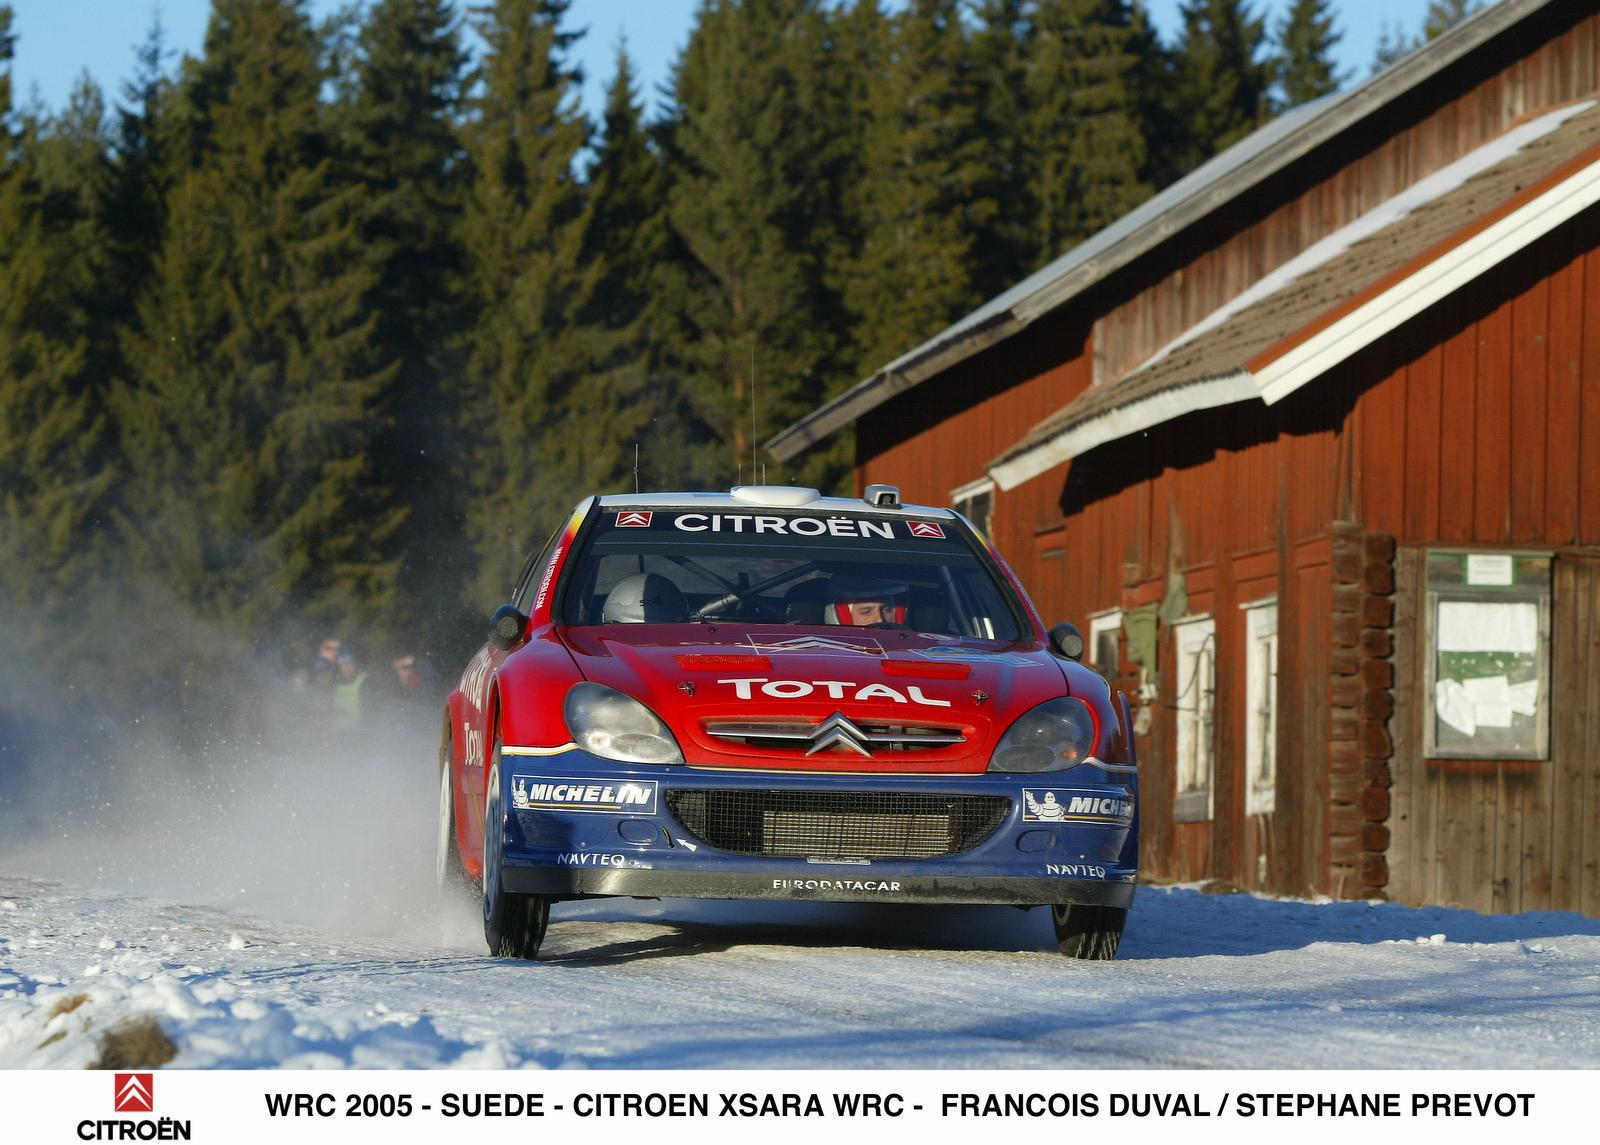 Xsara WRC 2005 en Suède